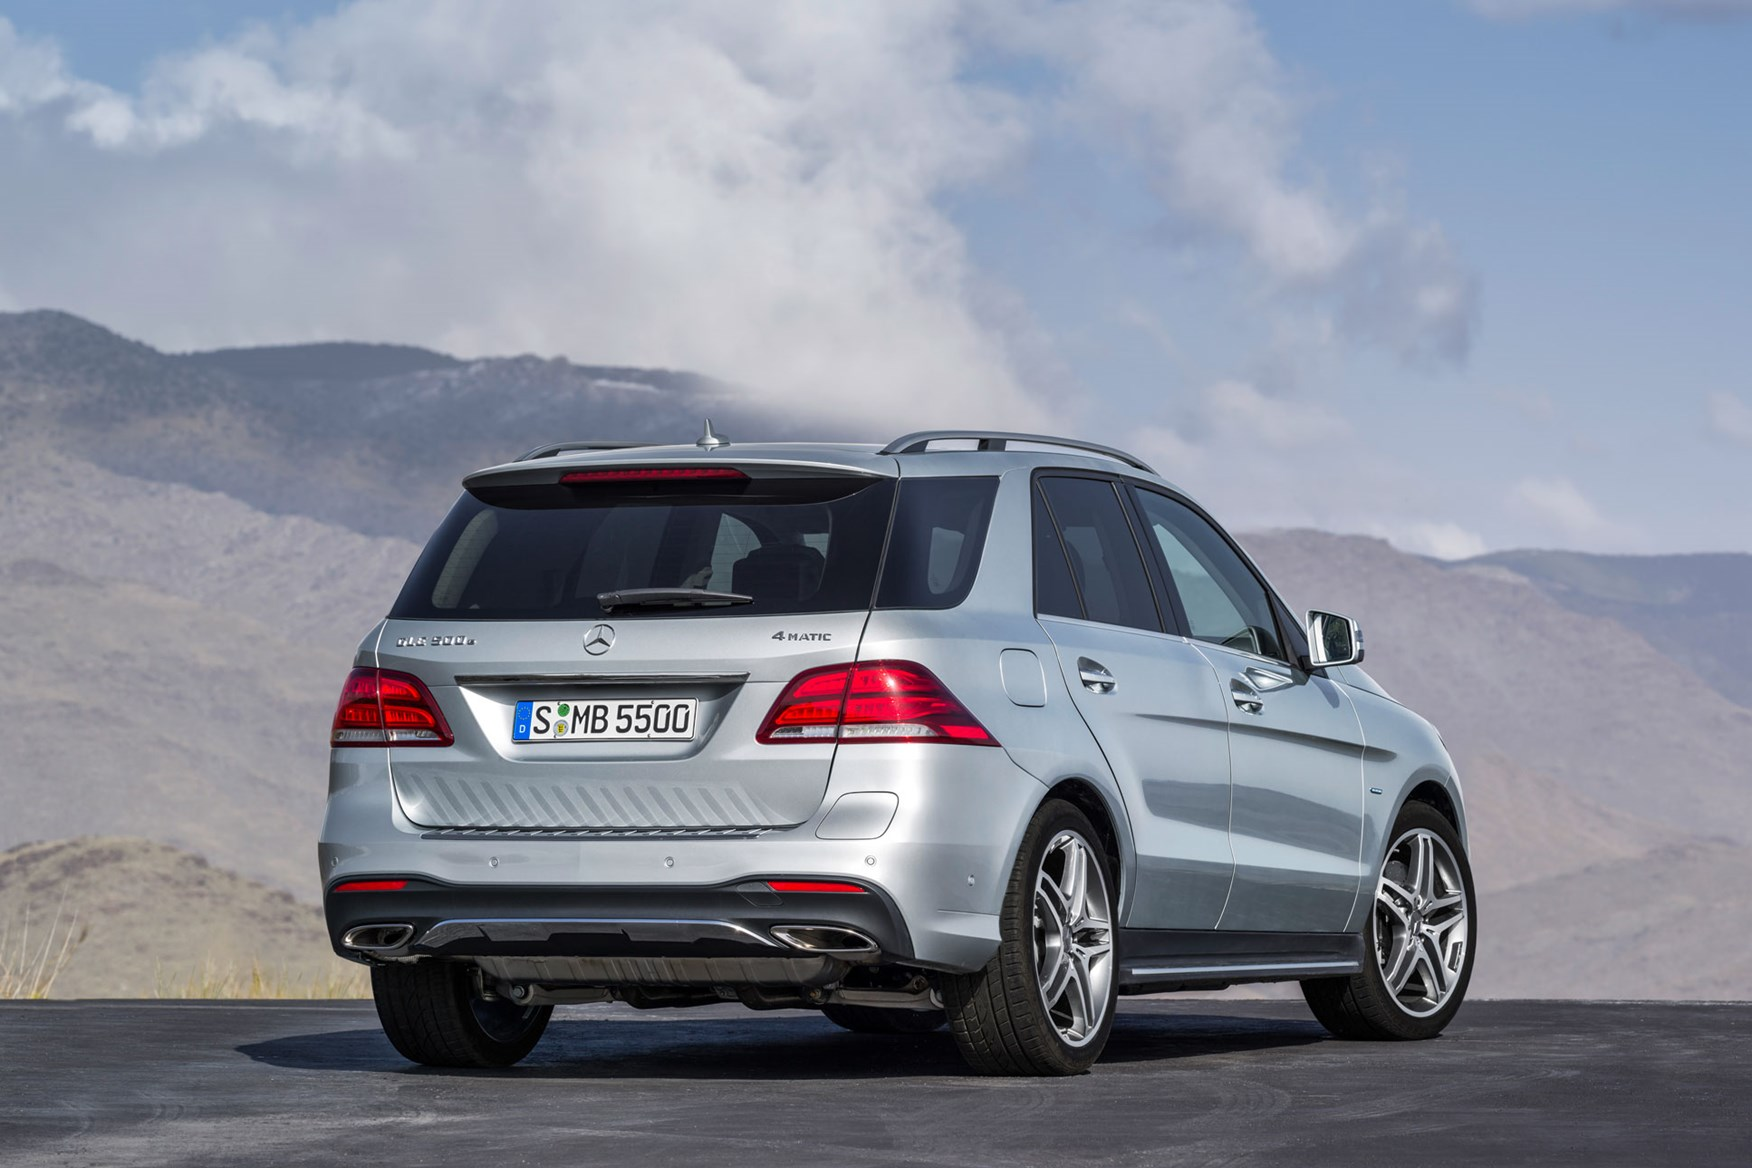 Mercedes ml series